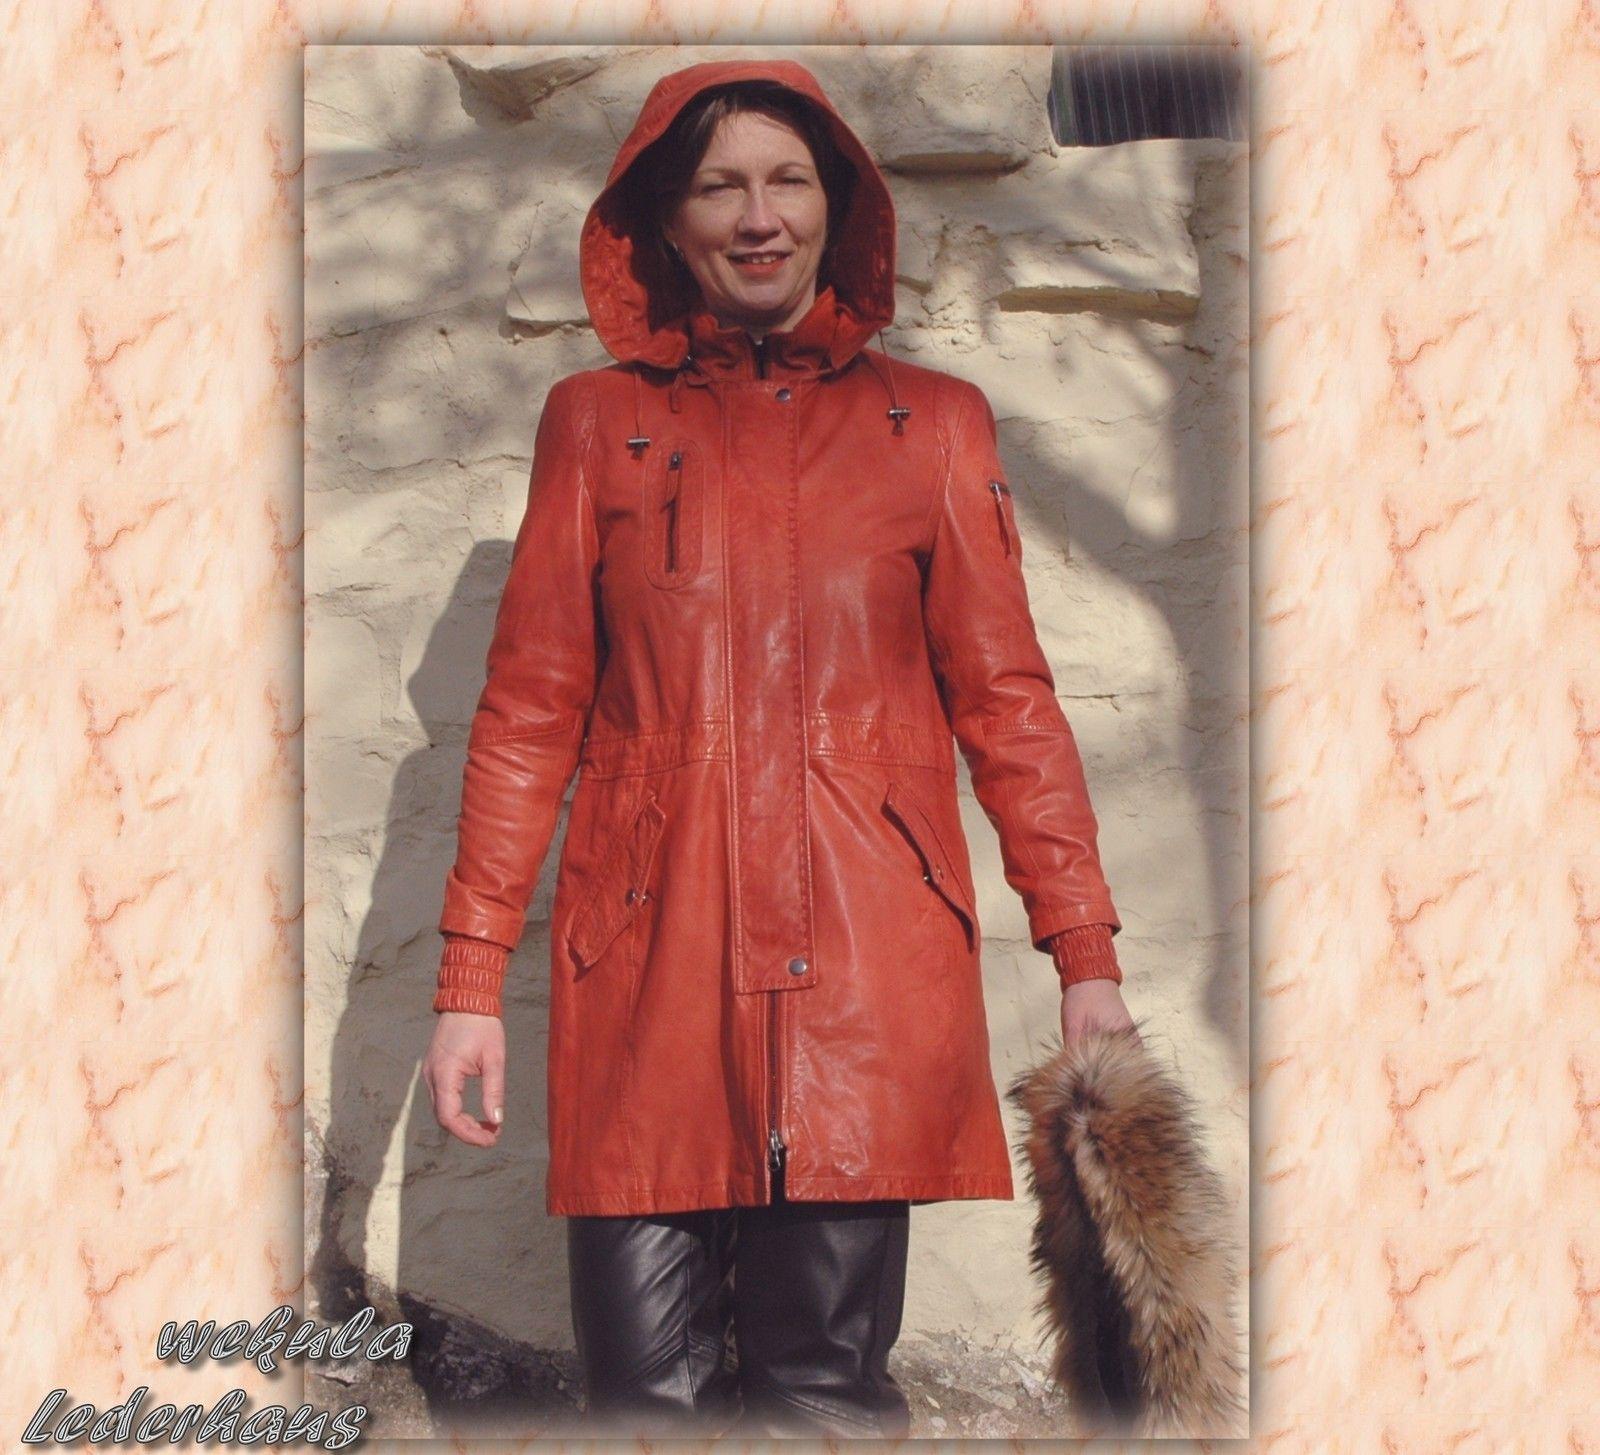 http://www.ebay.de/itm/Lederparka-lange-Winterjacke-rot-braun-oder-beige-Gr-38-40-42-44-46-48-NEU-/131065960147?var=